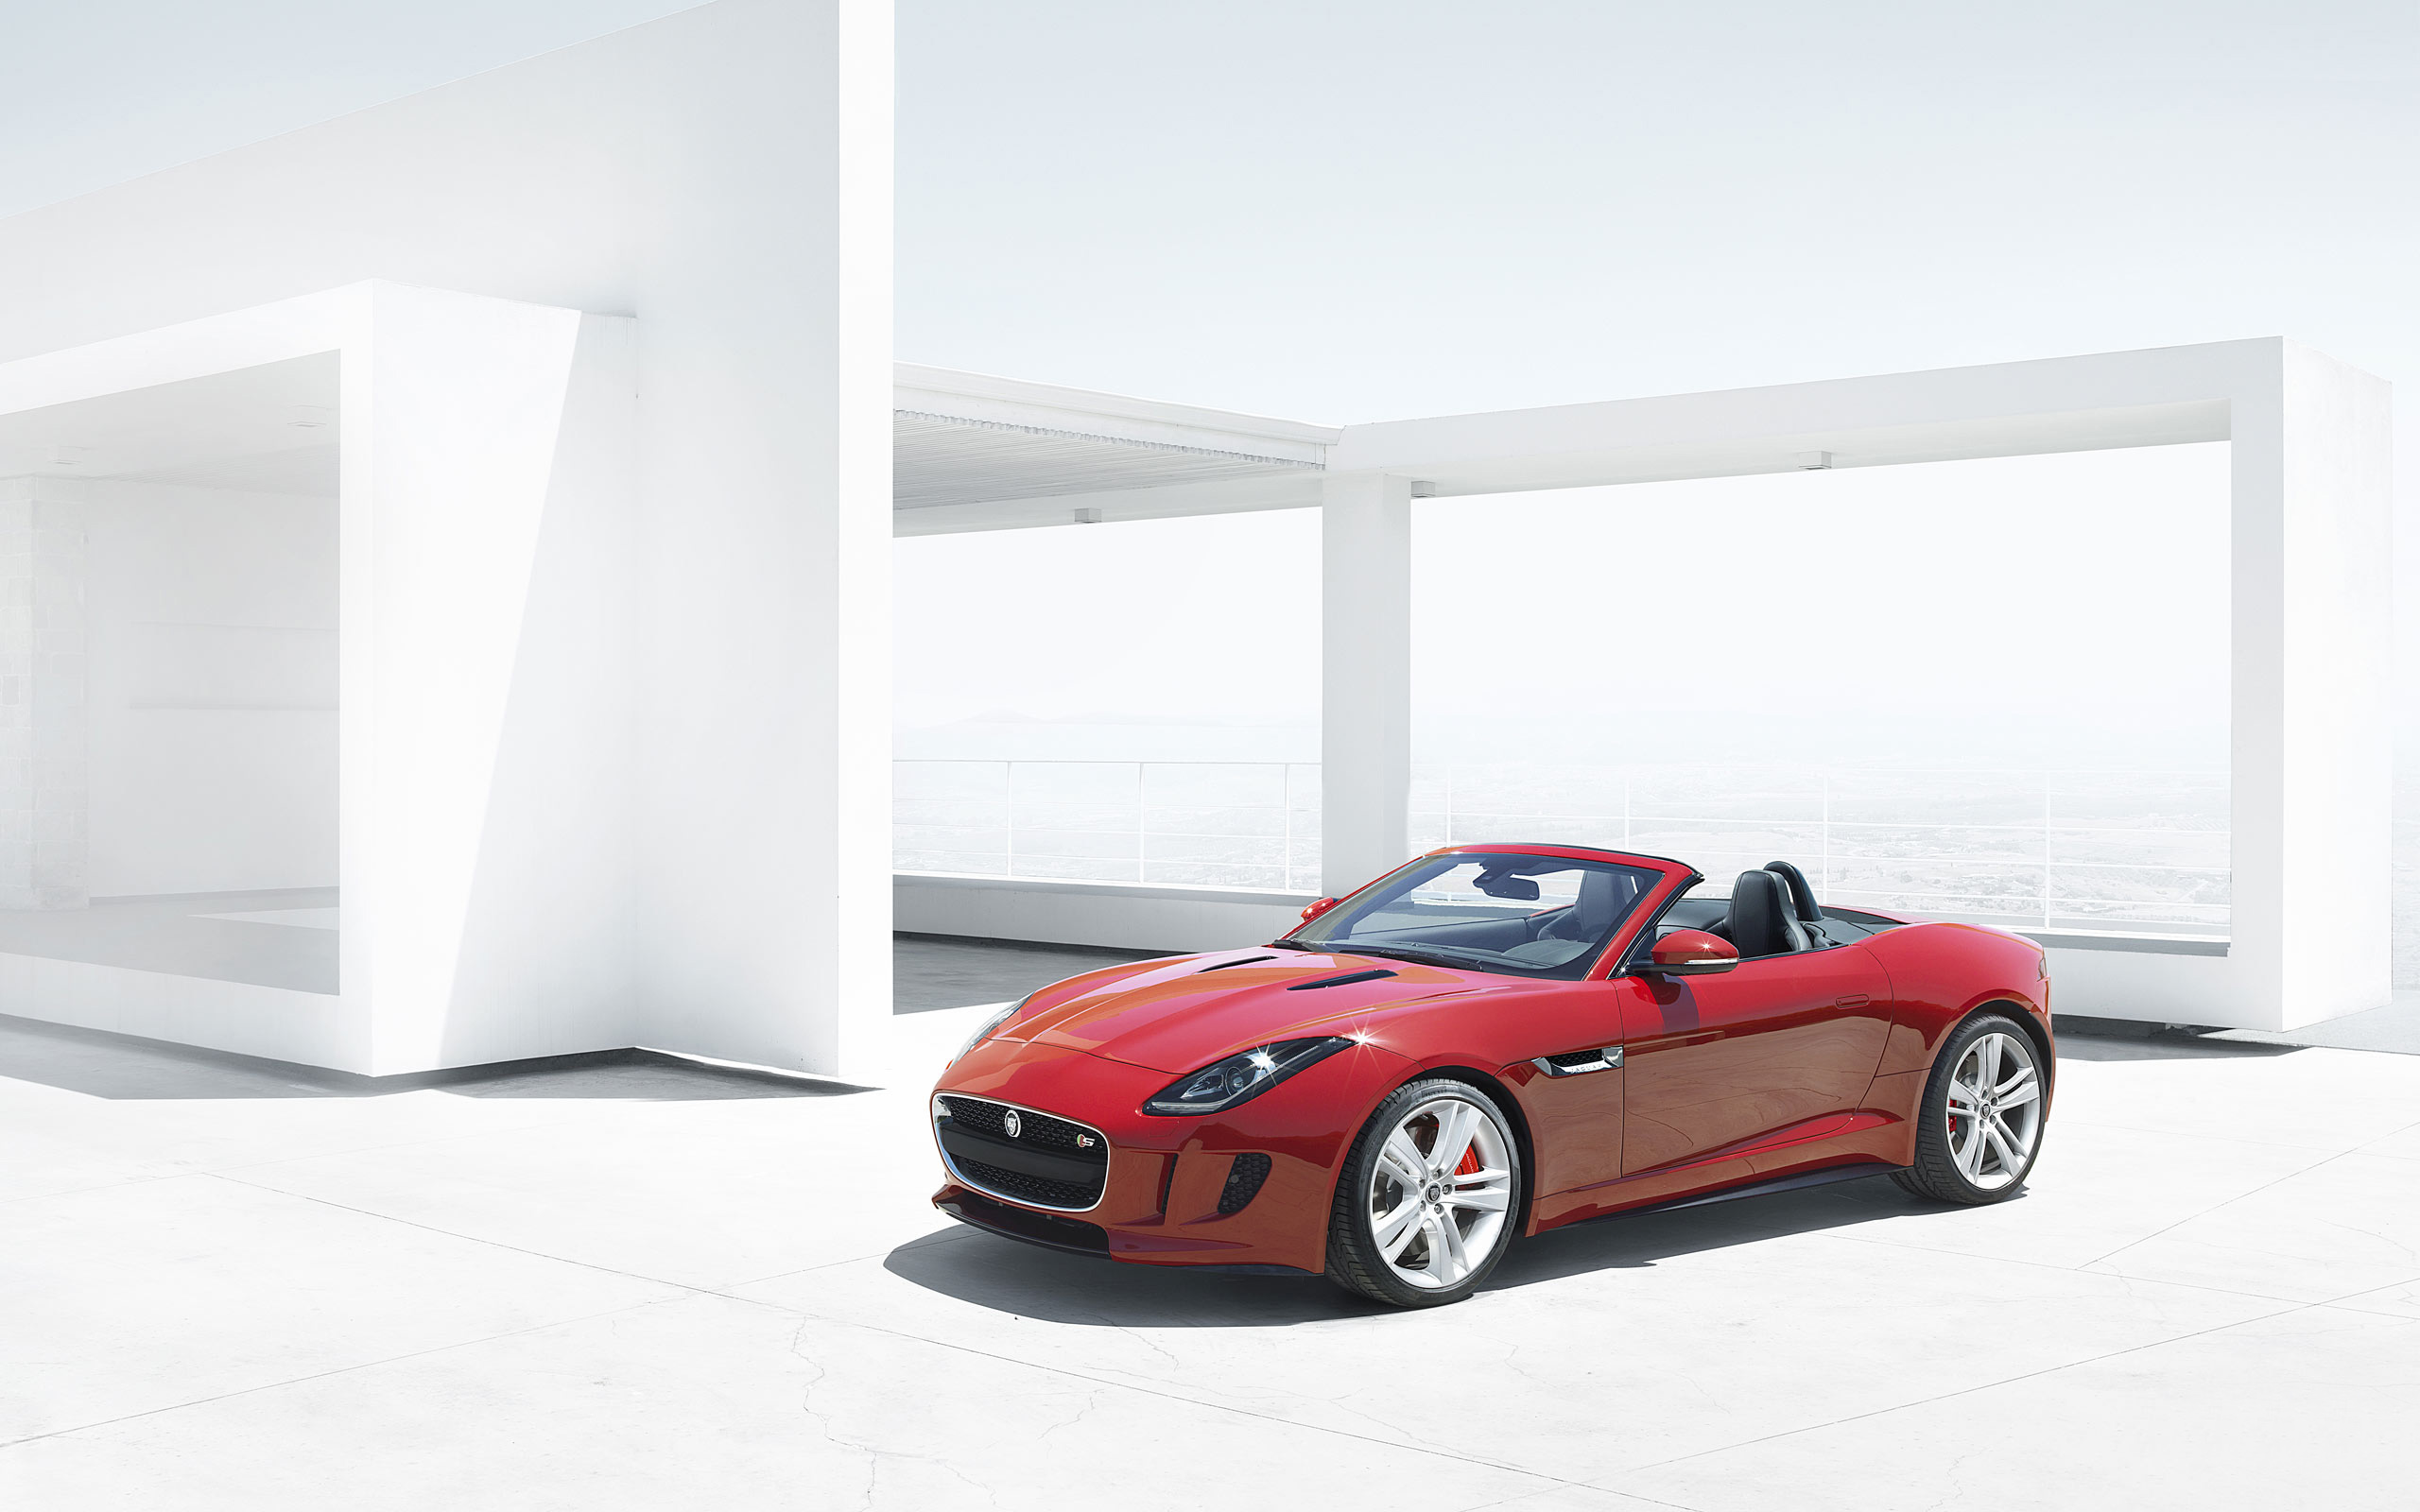 2014 jaguar f type wallpaper hd car wallpapers. Black Bedroom Furniture Sets. Home Design Ideas